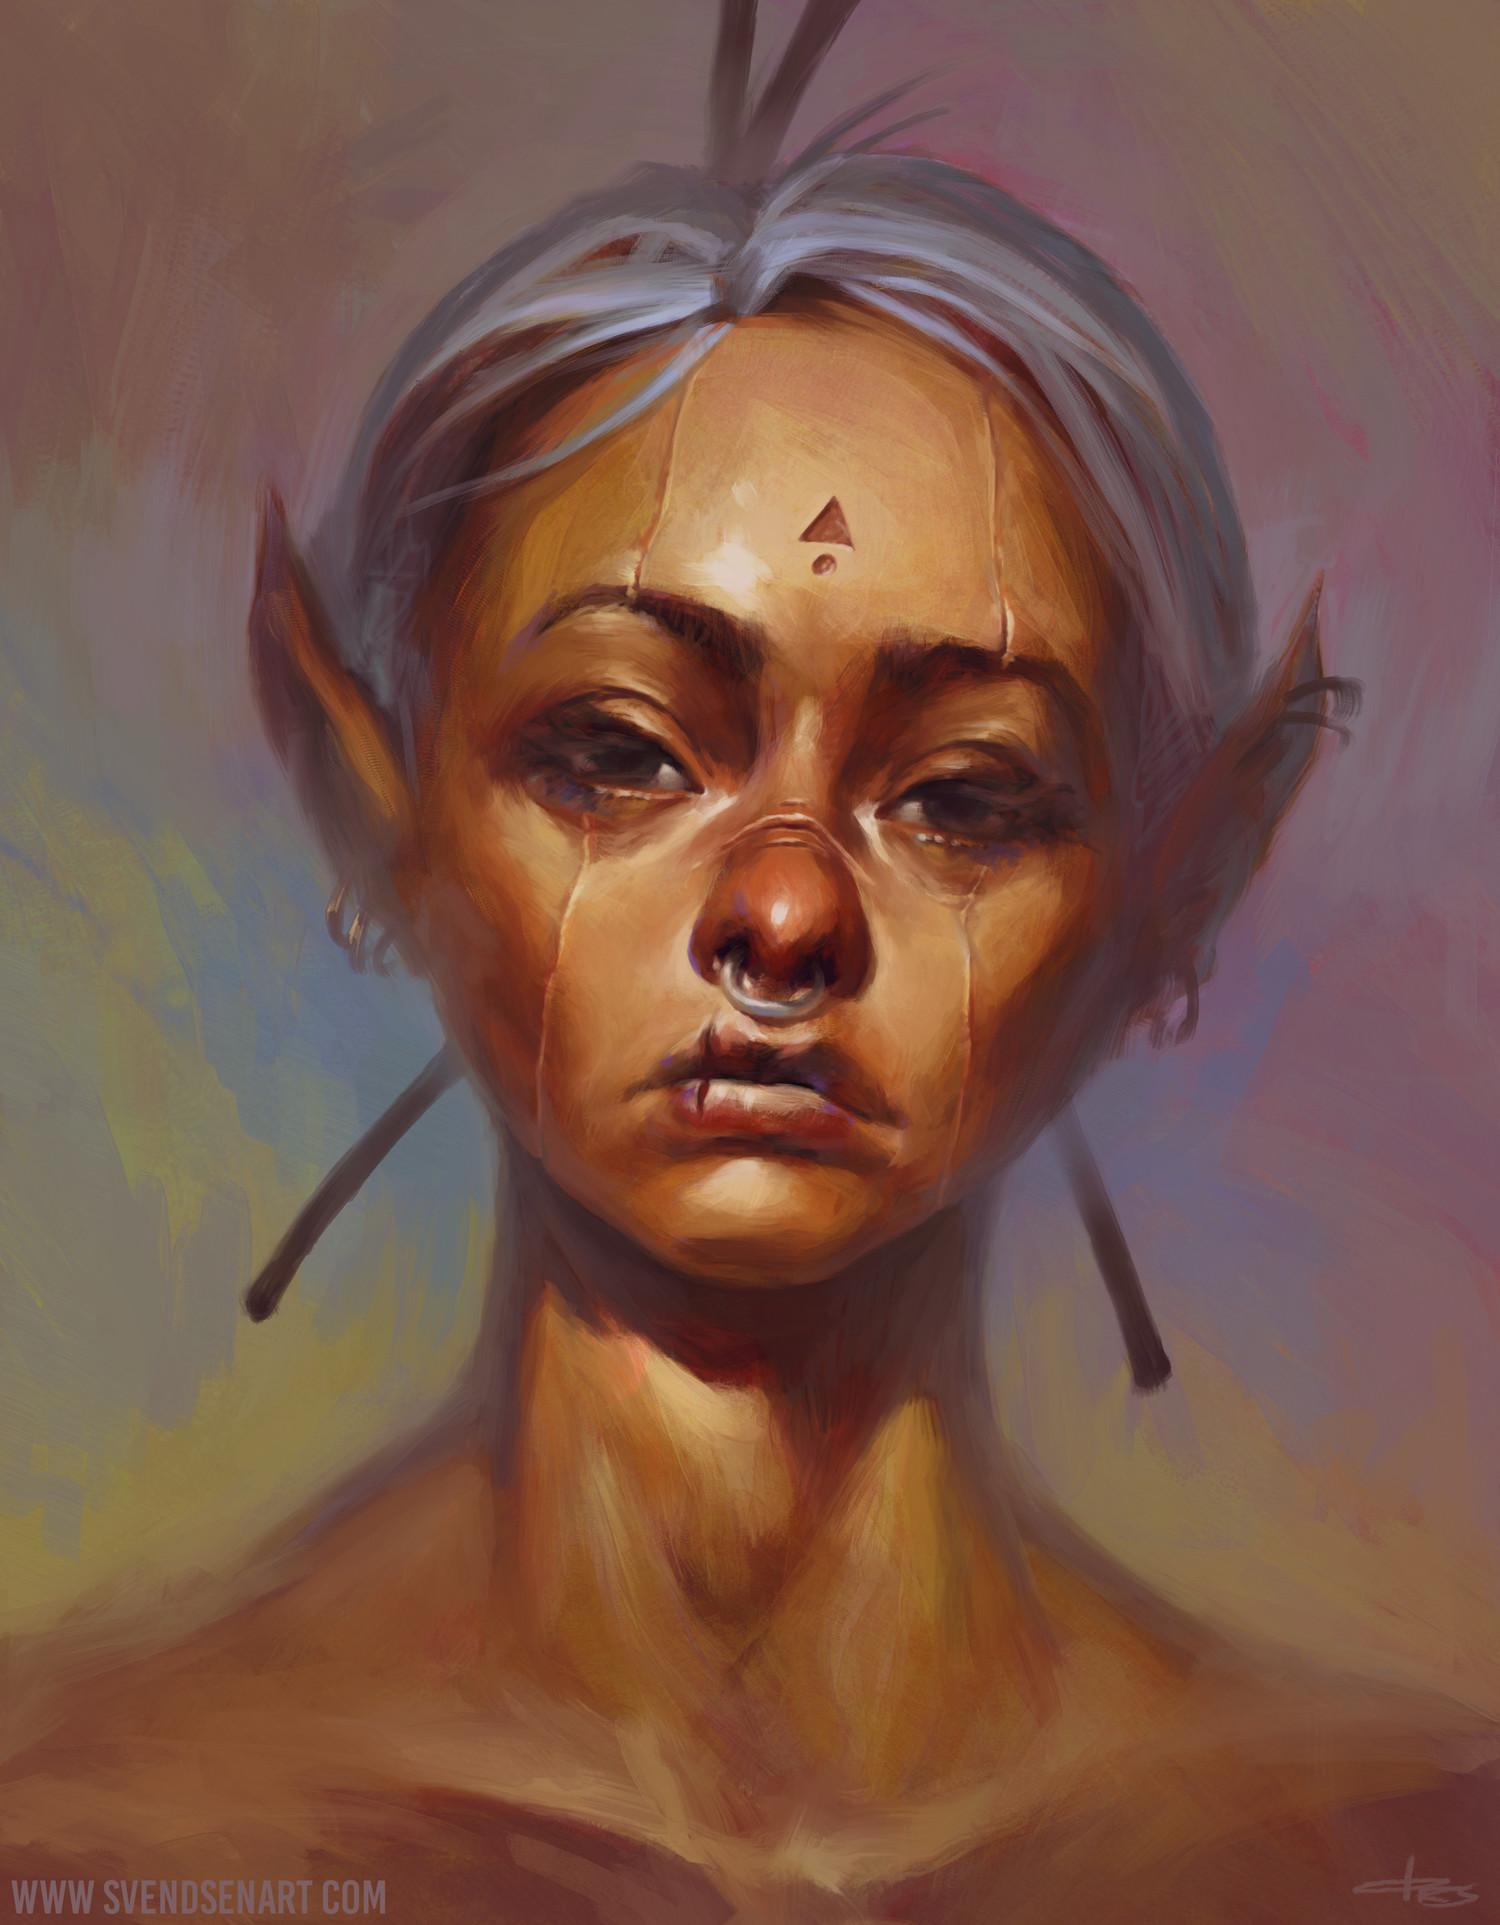 Elfy tribe gurl